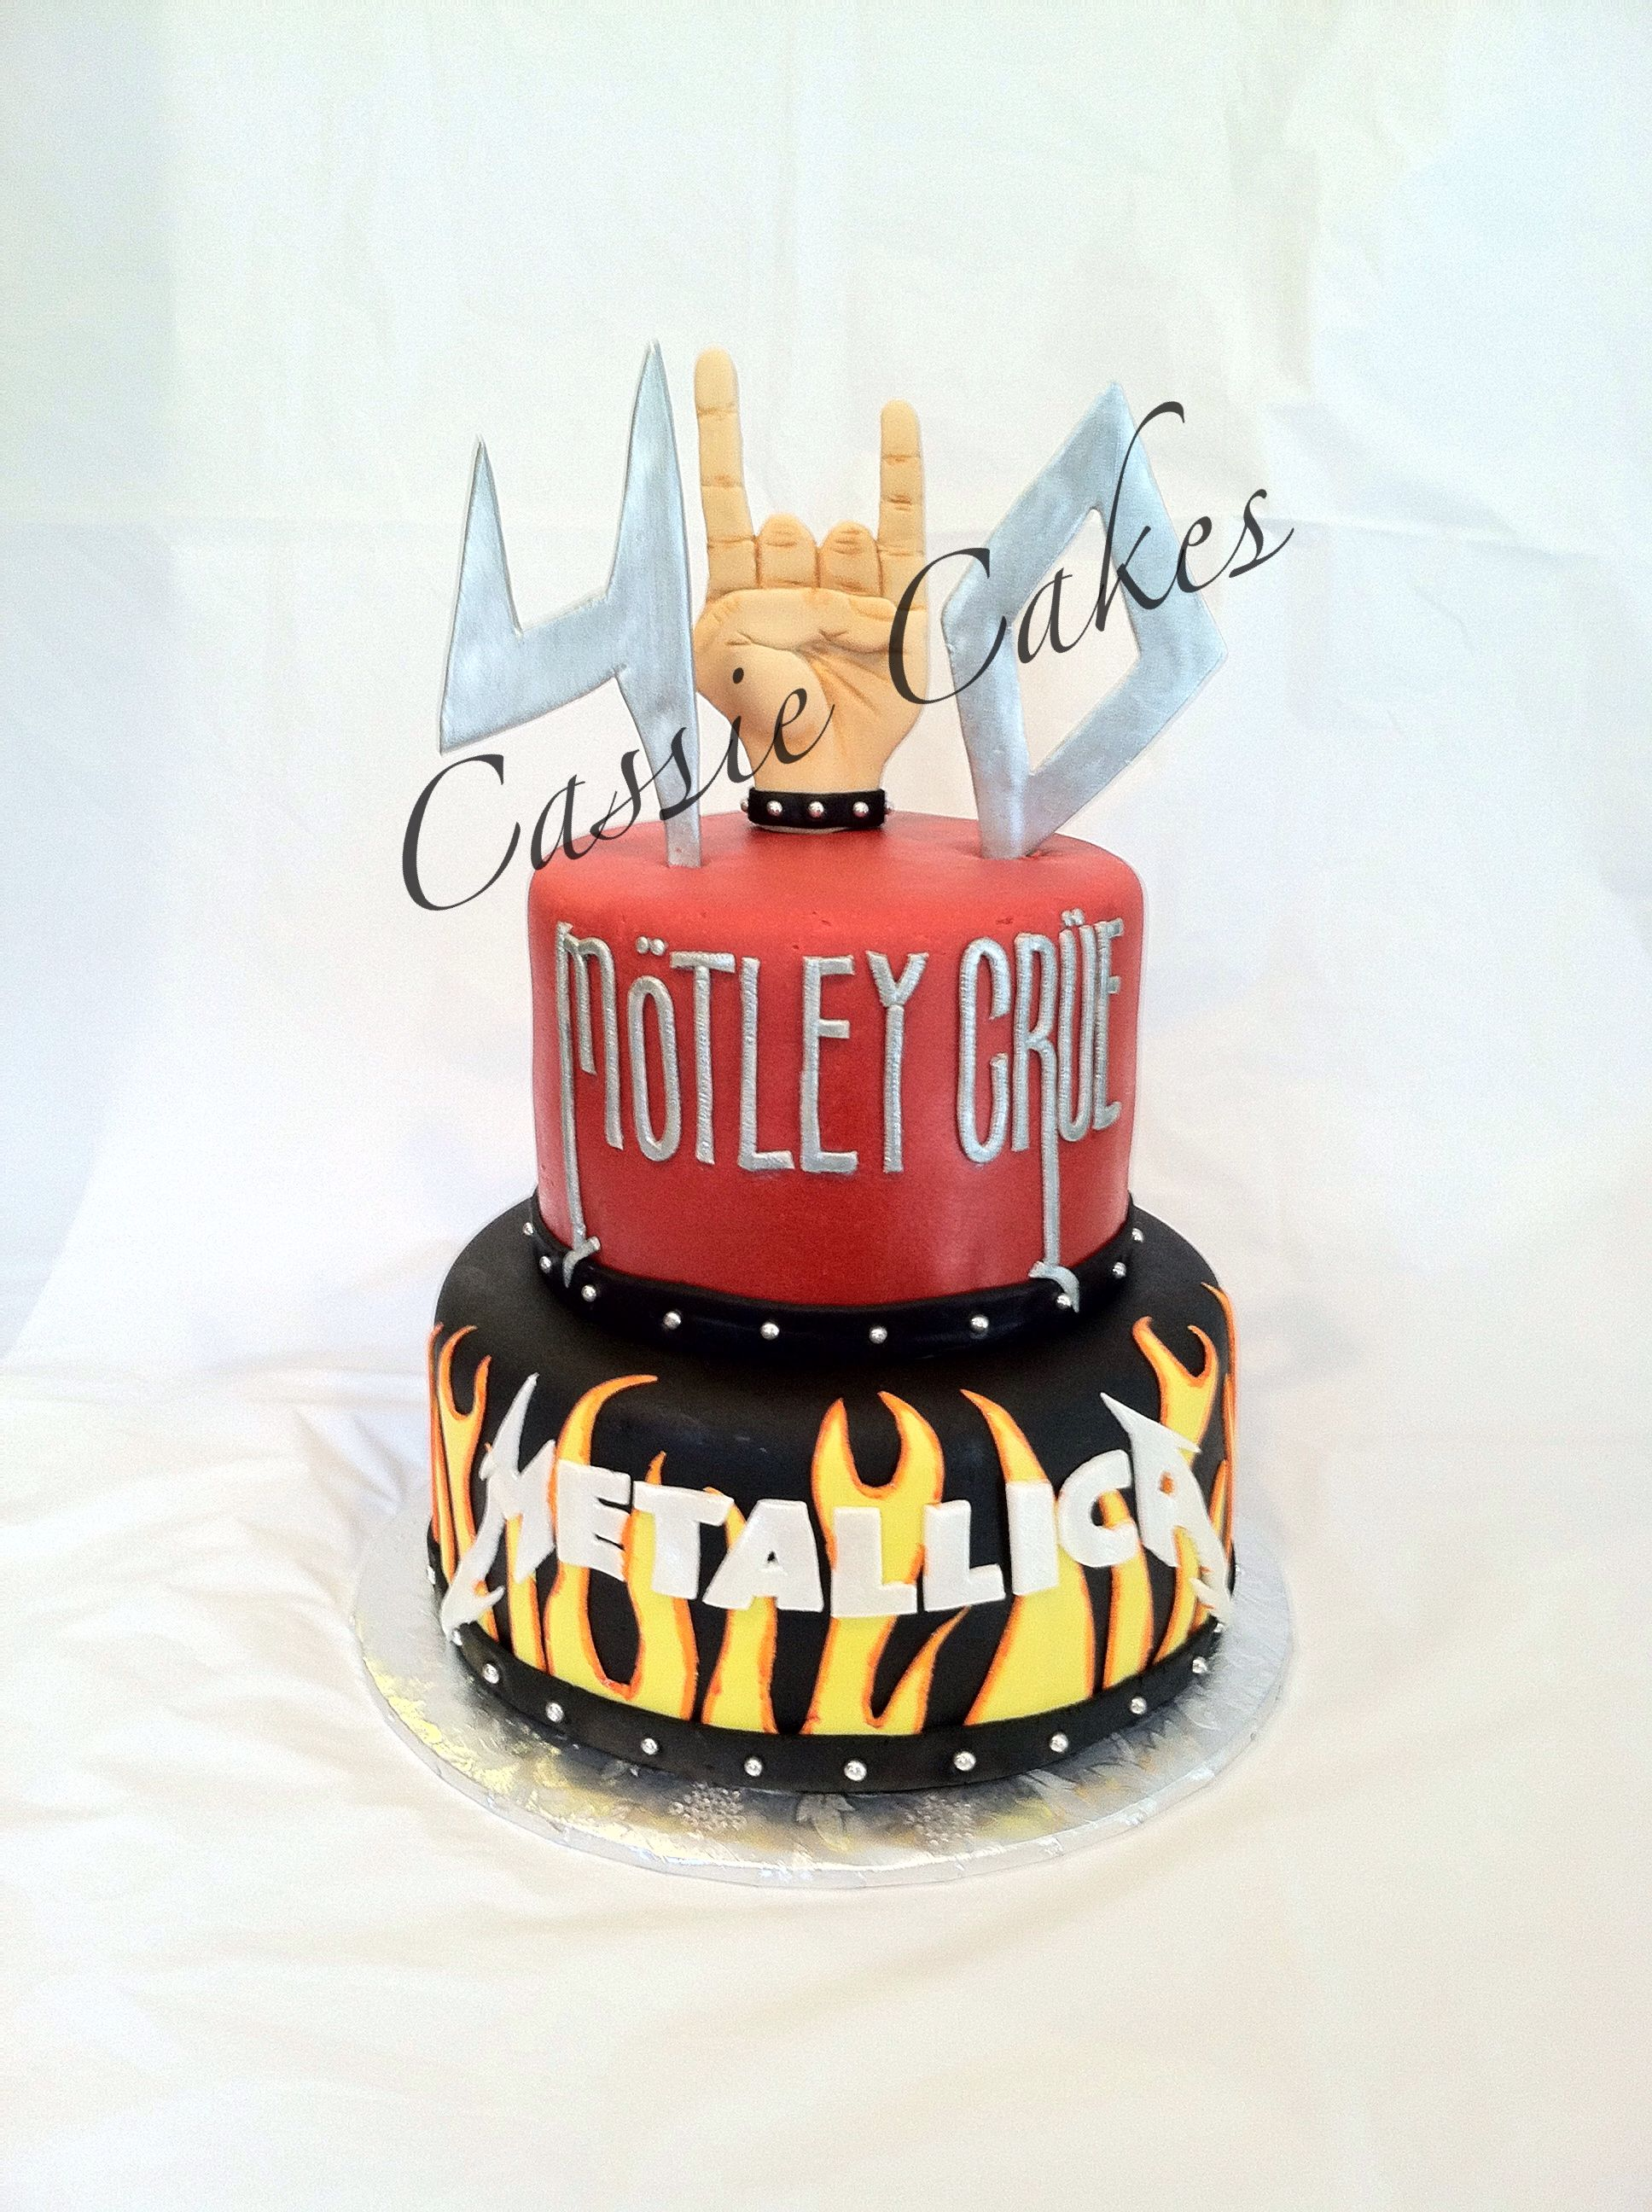 Rock N Roll Cake Motley Crue Metallica Love The Cake But I M Not